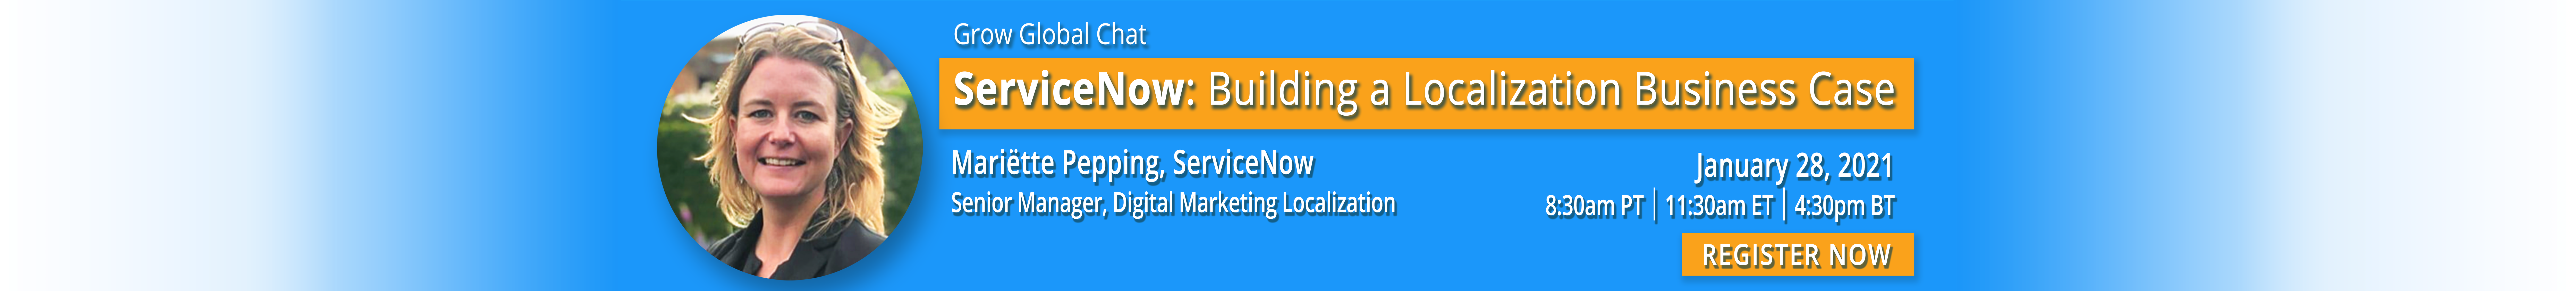 Webinar-2021-1-ServiceNow-Homepage5c